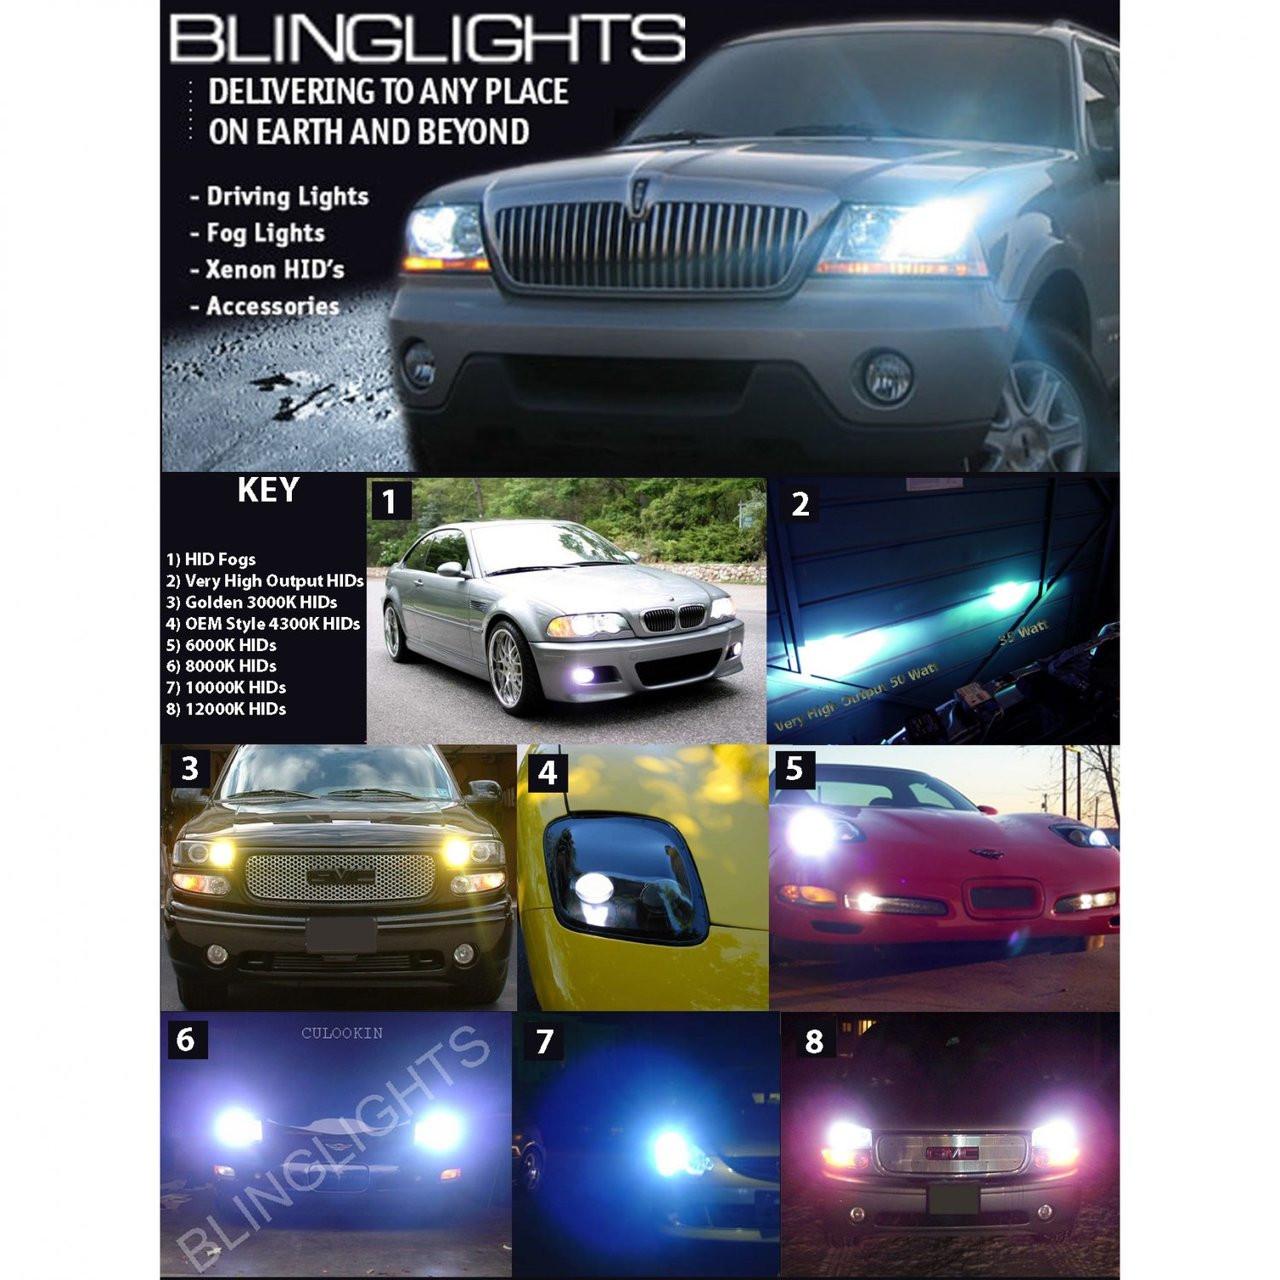 medium resolution of 1994 1995 1996 1997 1998 1999 cadillac deville xenon hid conversion kit for headlamps headlights